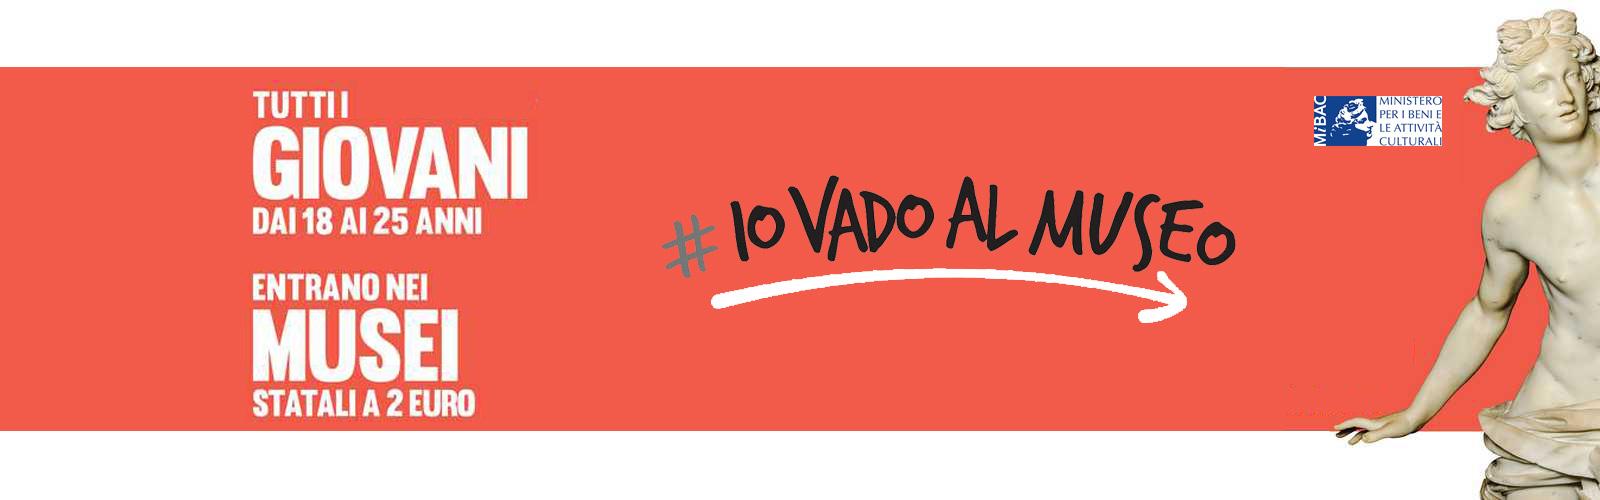 #iovadoalmuseo